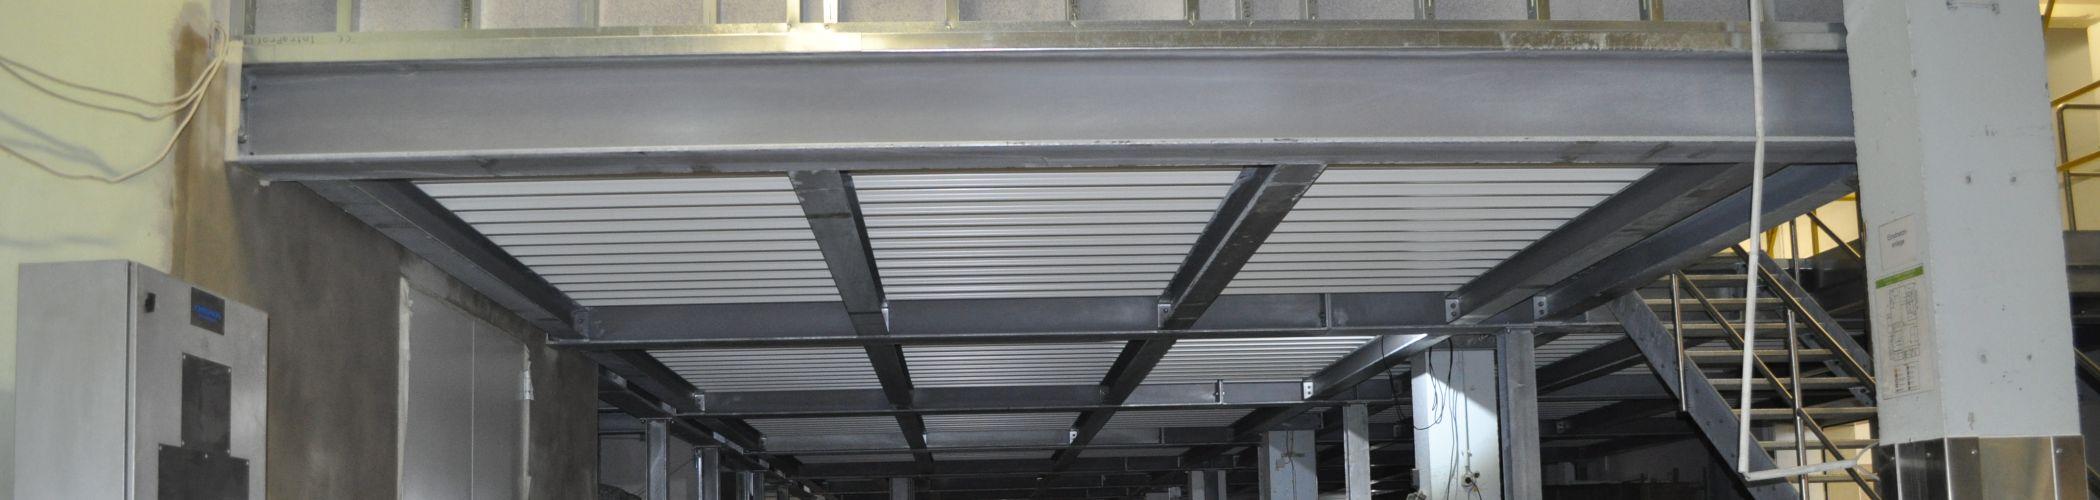 Metallbau Kumbartzki GmbH & Co. KB